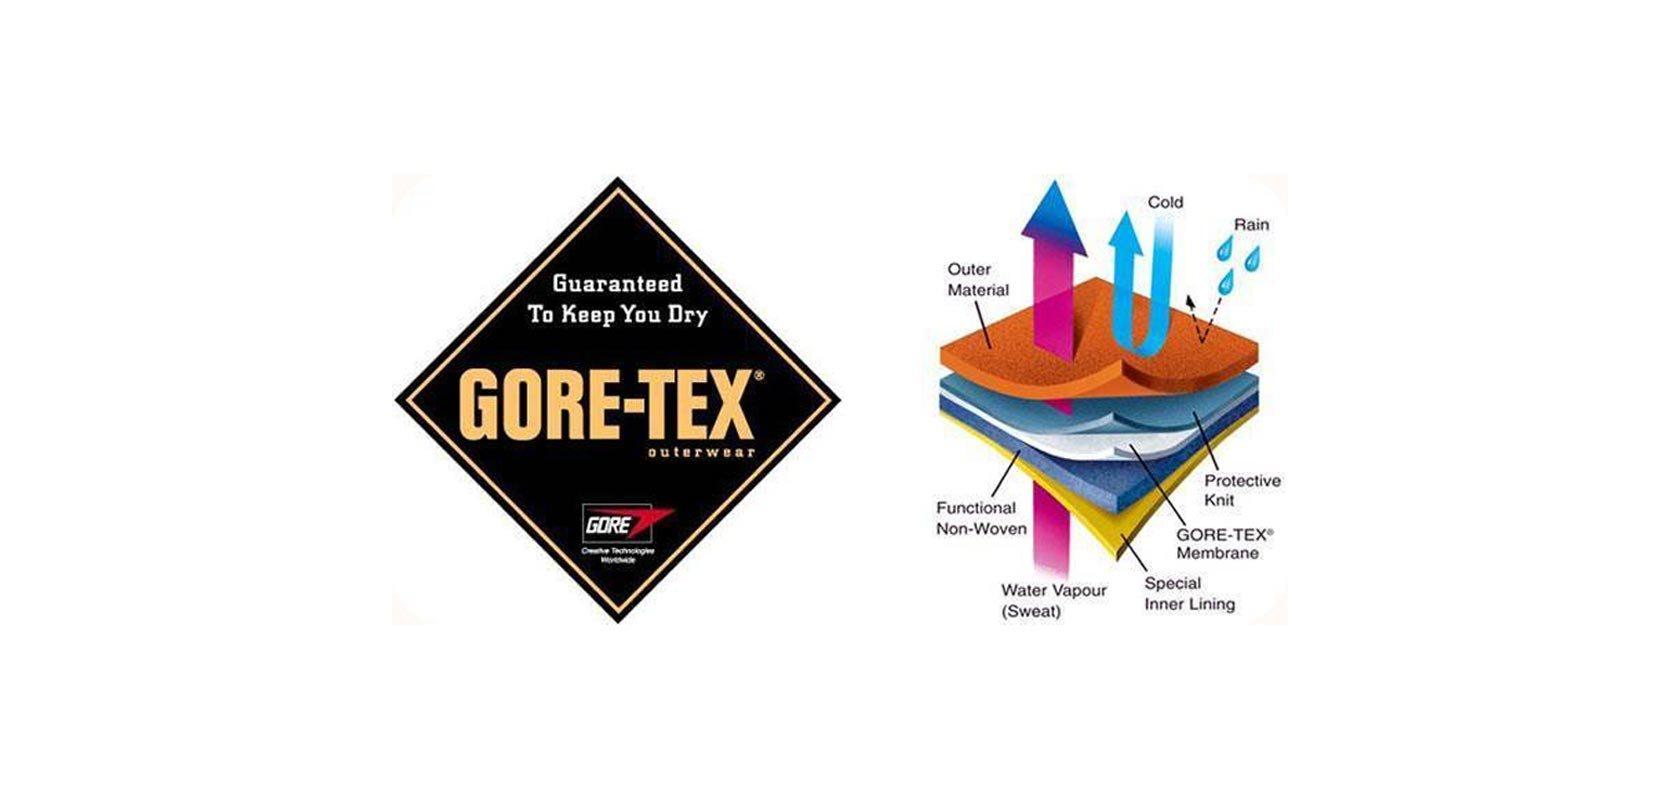 The North Face Gore-Tex jakke